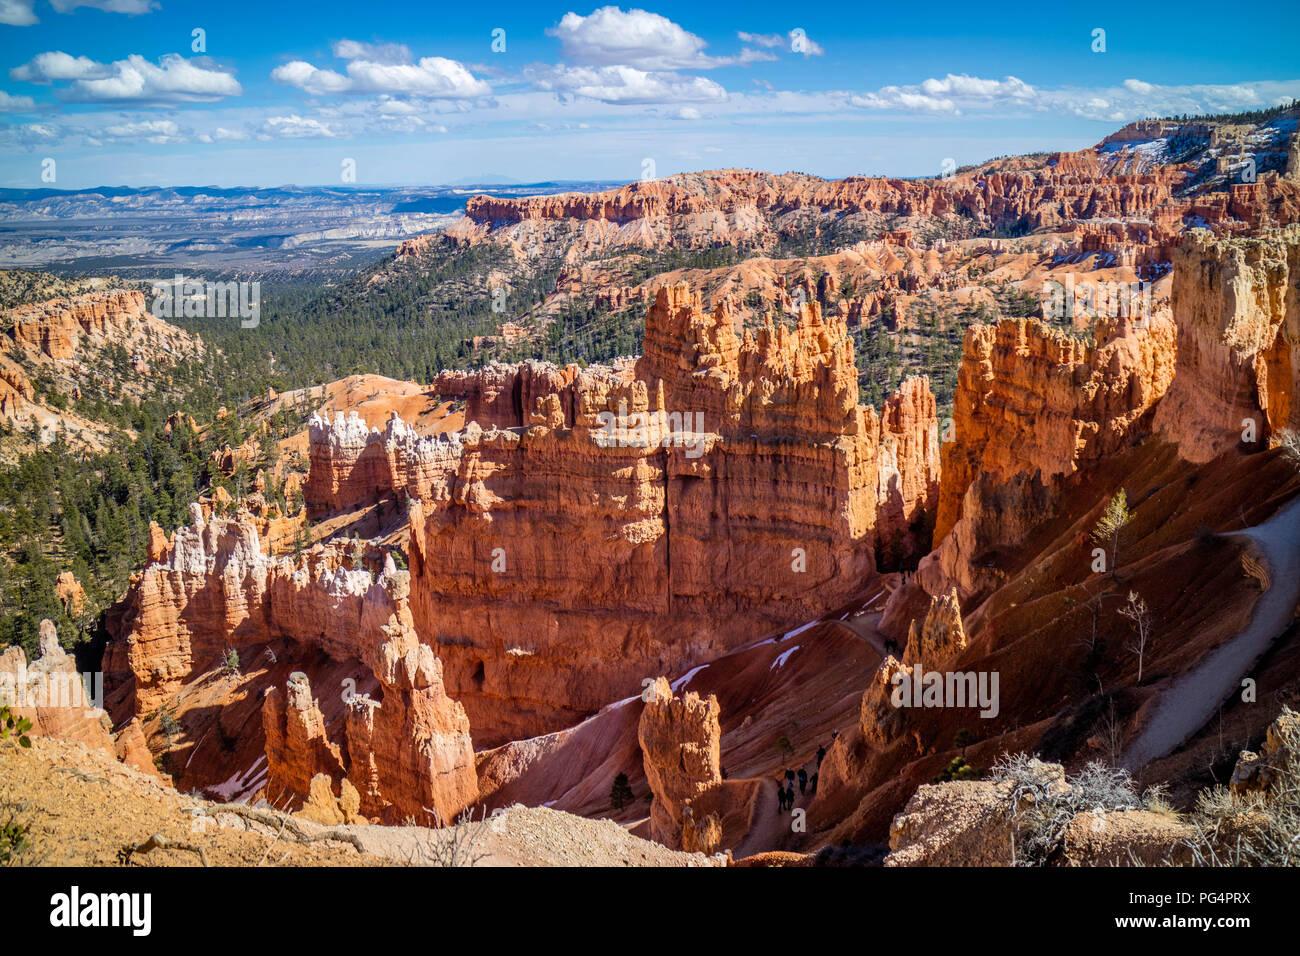 Natürliche Felsformation der berühmten Website des Bryce Canyon National Park Stockbild